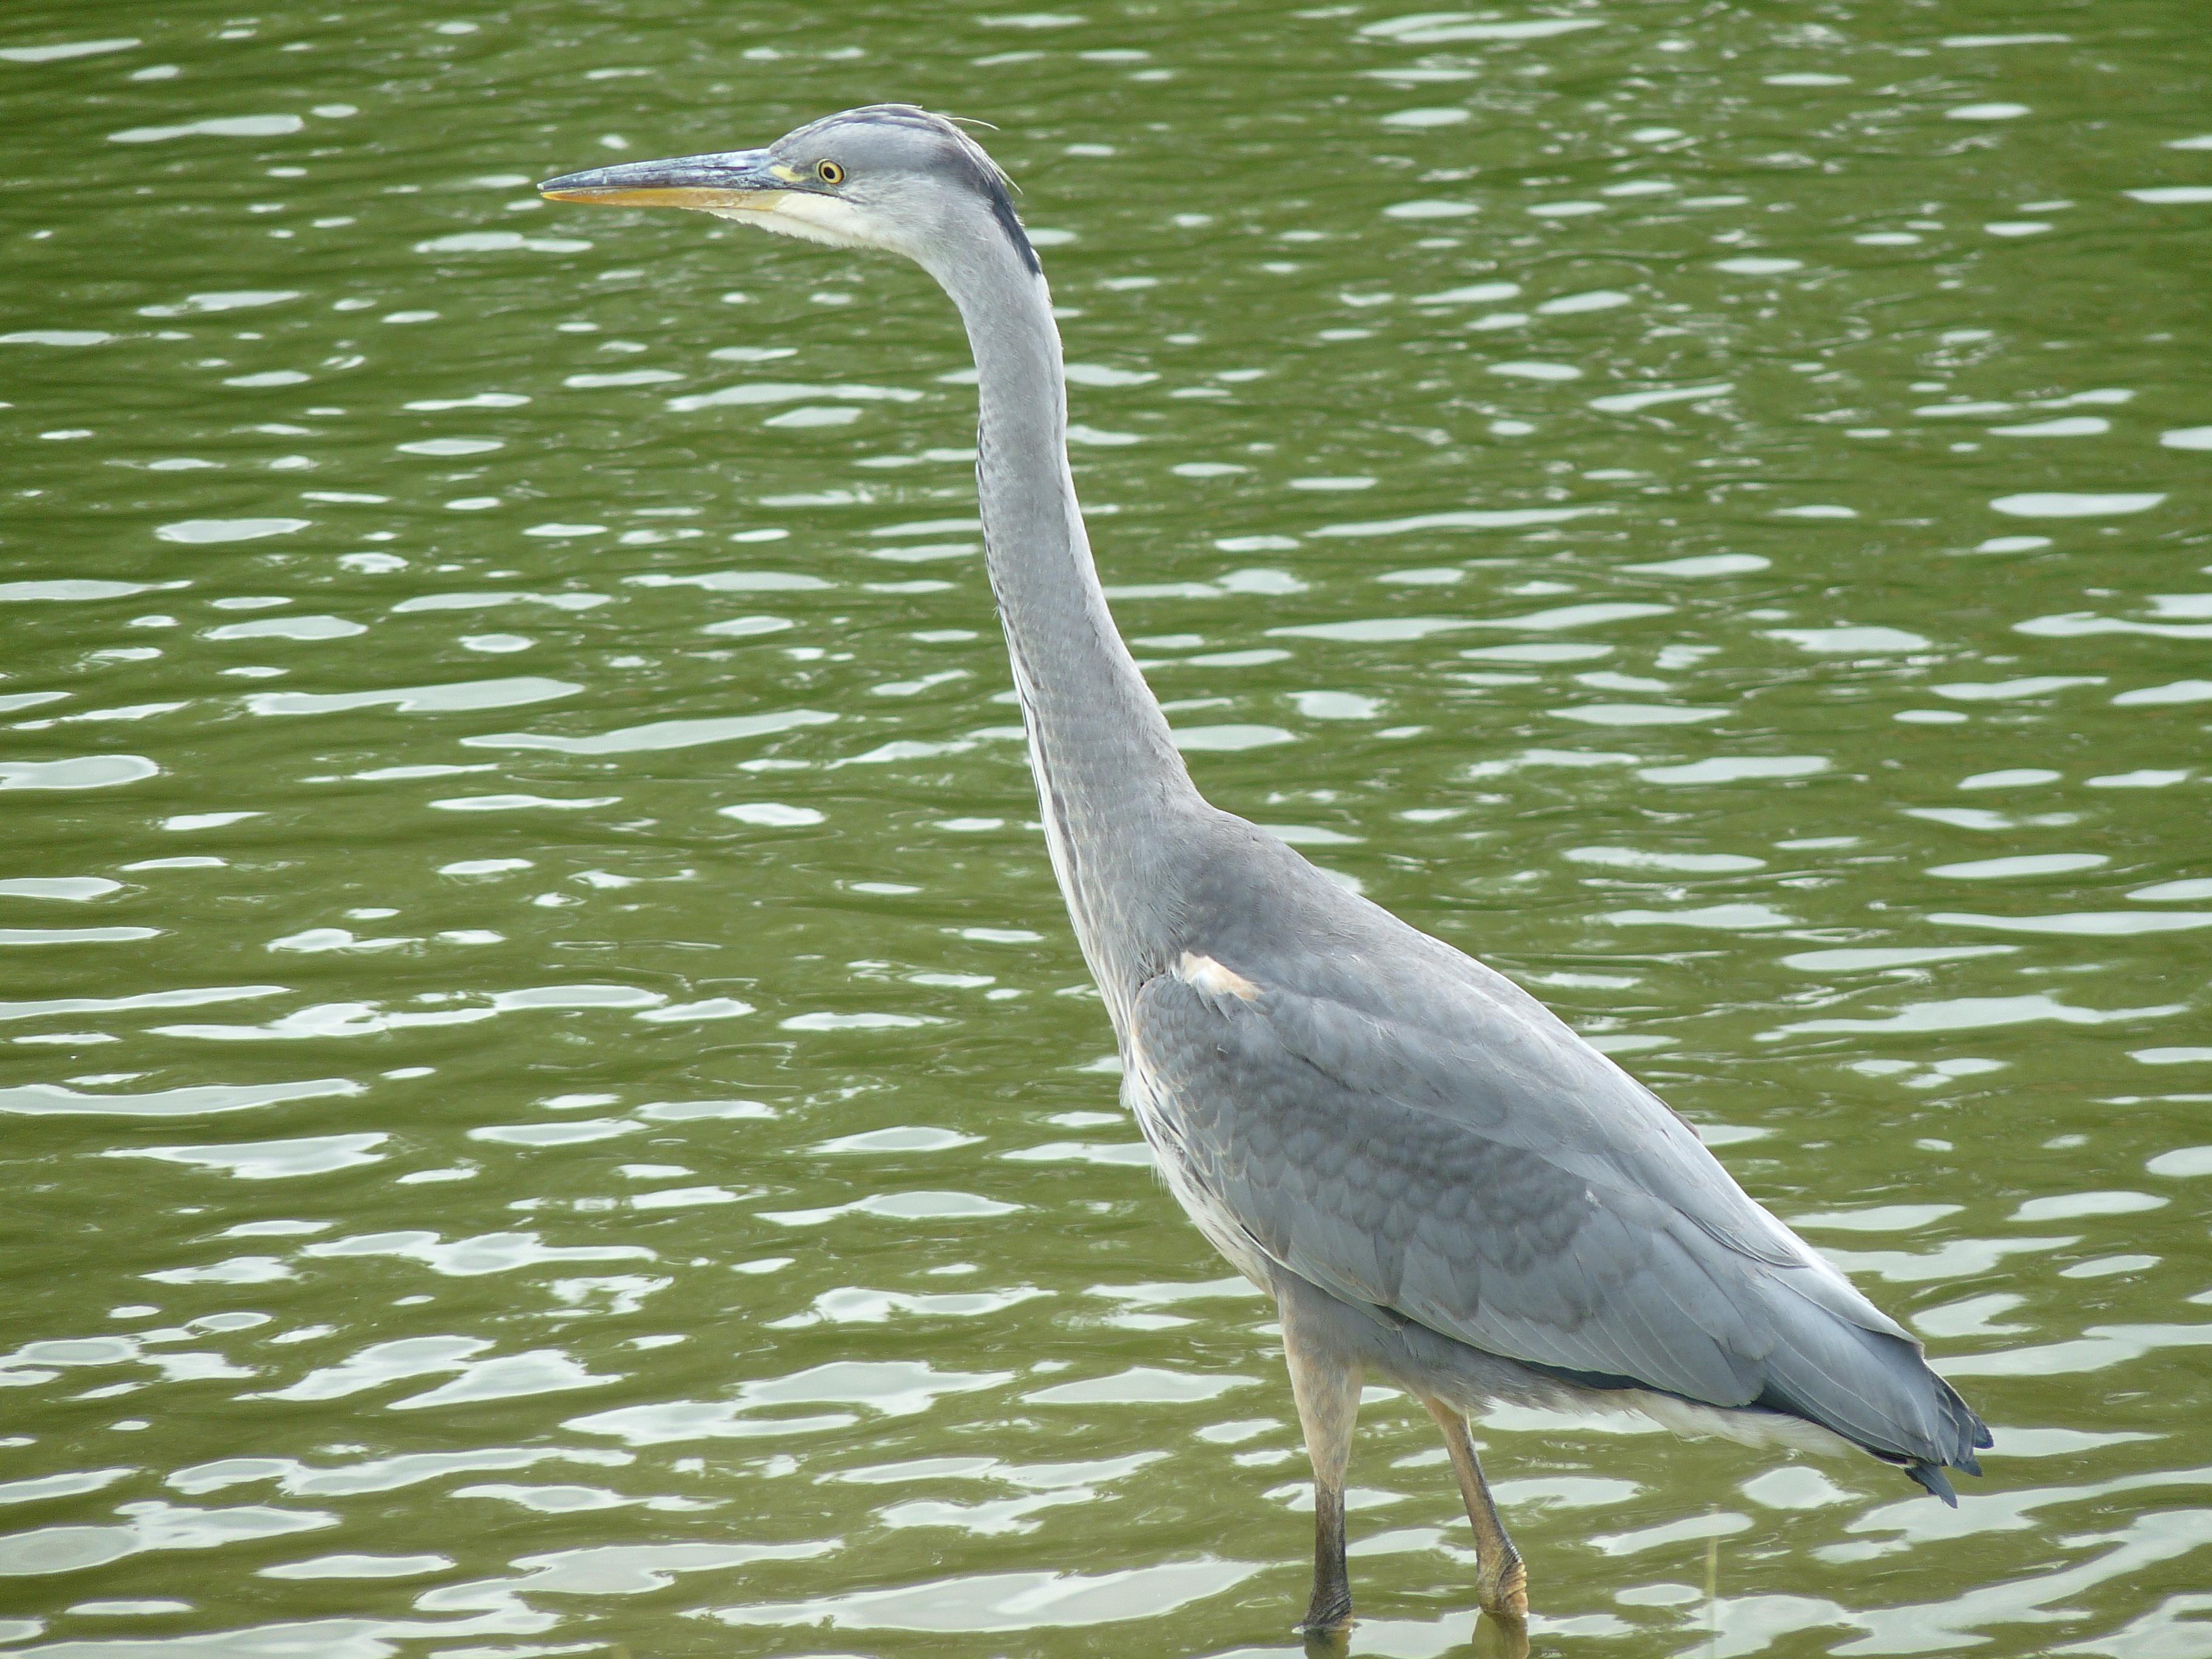 File:Grey Heron (5964308329).jpg - Wikimedia Commons